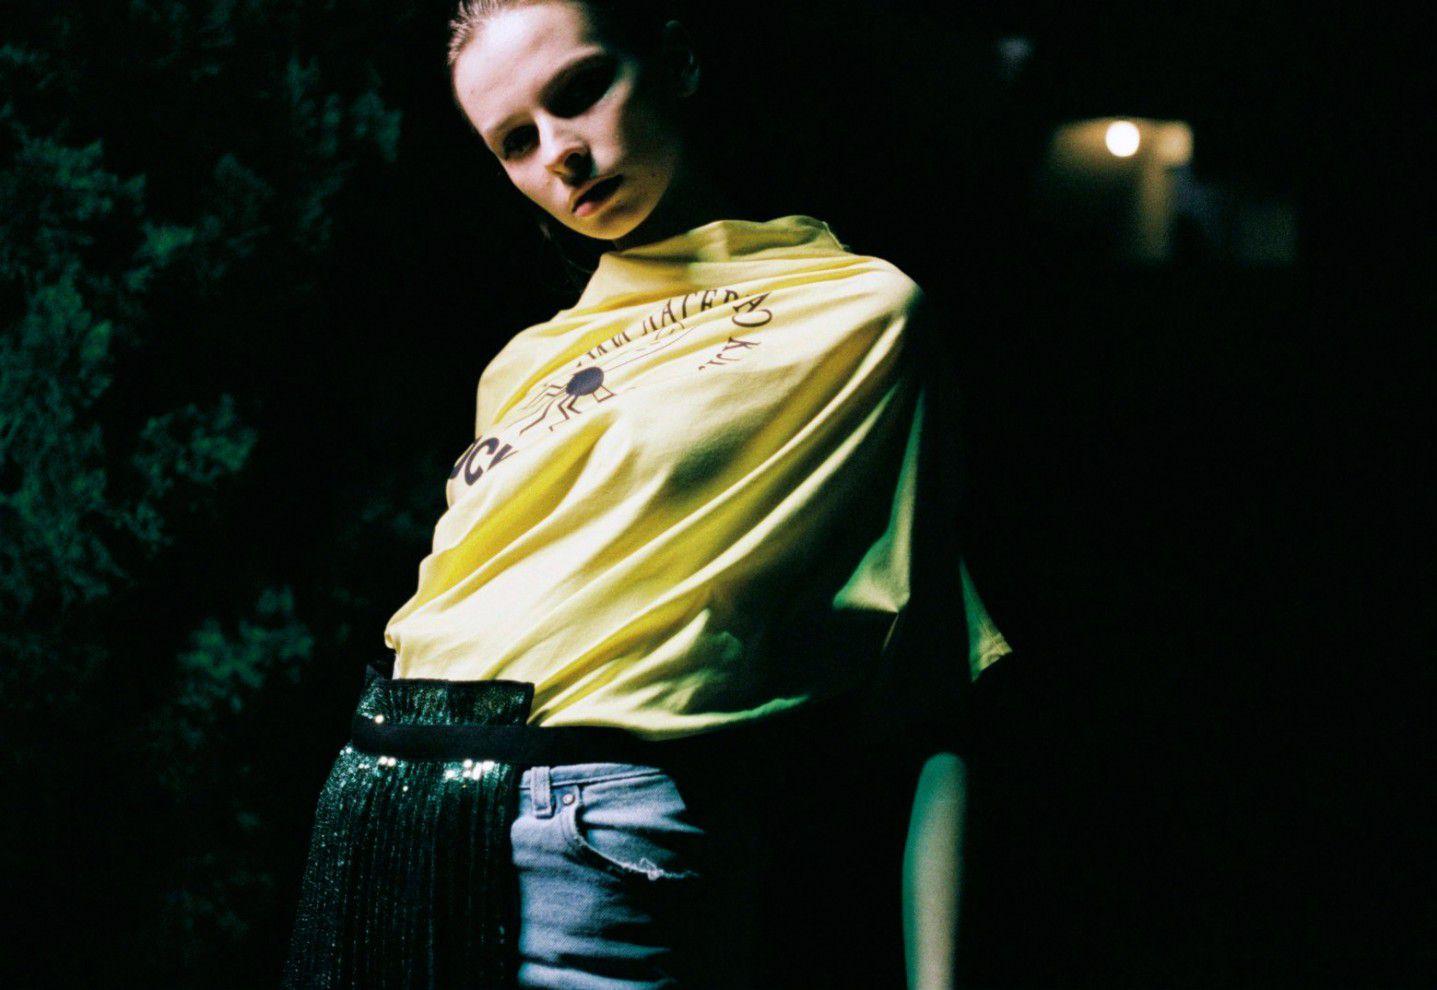 NeoL Magazine JP | Fashion Direction / Photo Editor : Lina Hitomi | Interview&Text: Ryoko Kuwahara | Executive Producer: Lisa Tanimura | Photographer:Toshiaki Kitaoka | Stylist: Koji Oyamada | Hair&Make-up: Rie Shiraishi | Models: Alek, Morgan | Clothes sponsored by Farfetch #NeoLMagazine #junyawatanabe #junyawatanabecommedesgarcons #commedesgarcons #n21 #fashion #fashionphotography #farfetch #ファーフェッチ